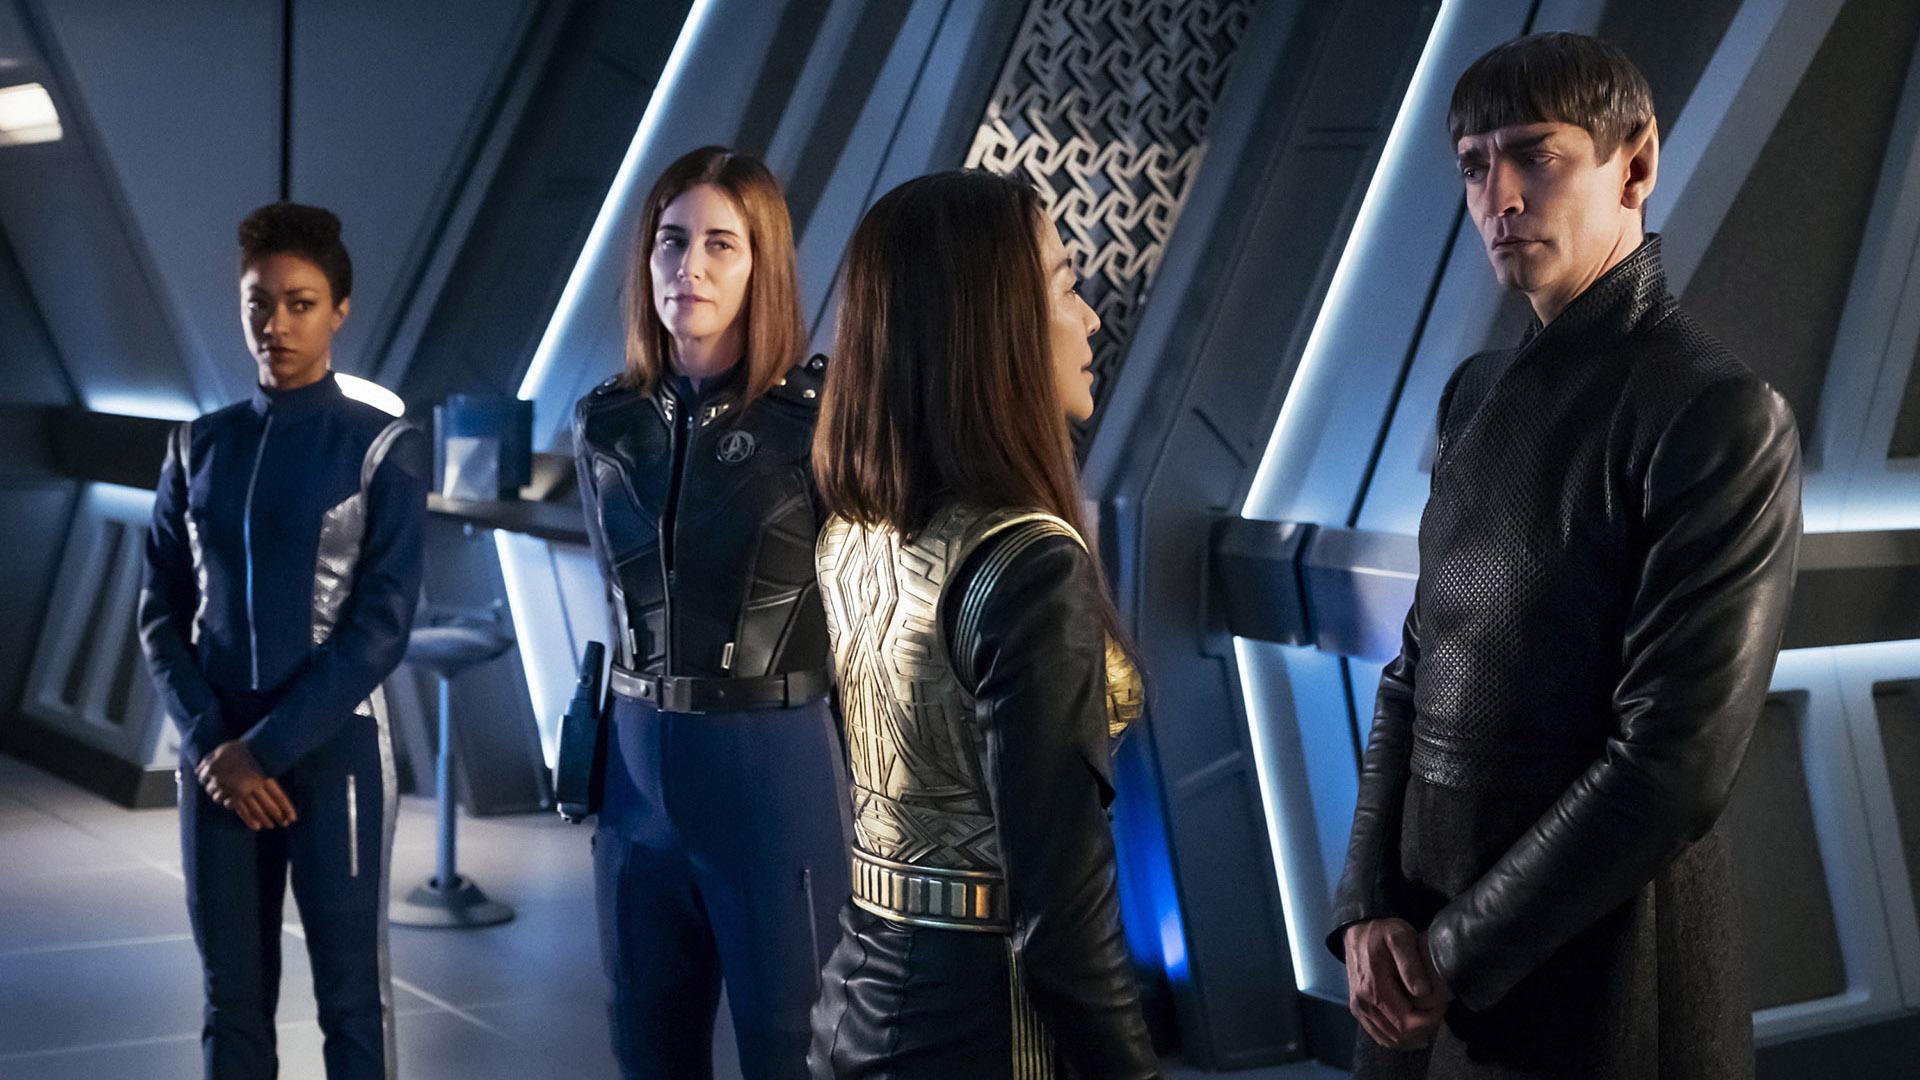 Michael Burnham (Sonequa Martin-Green), Admiral Cornwell (Jayne Brook), Mirror Philippa Georgiou (Michelle Yeoh), and Ambassador Sarek (James Frain)